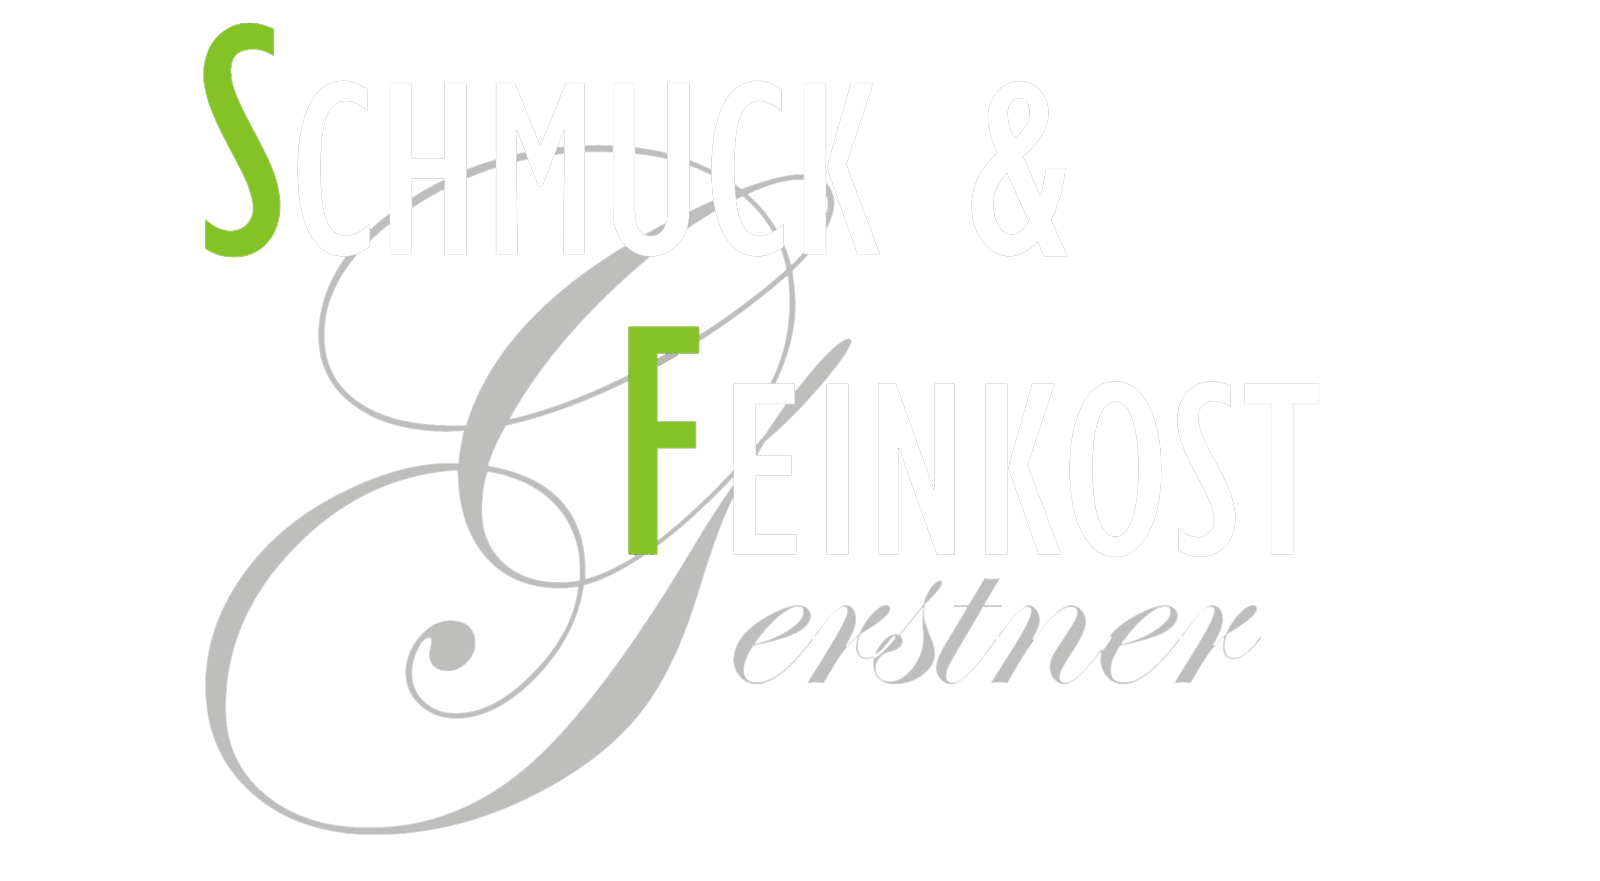 Gerstner Schmuck & Feinkost